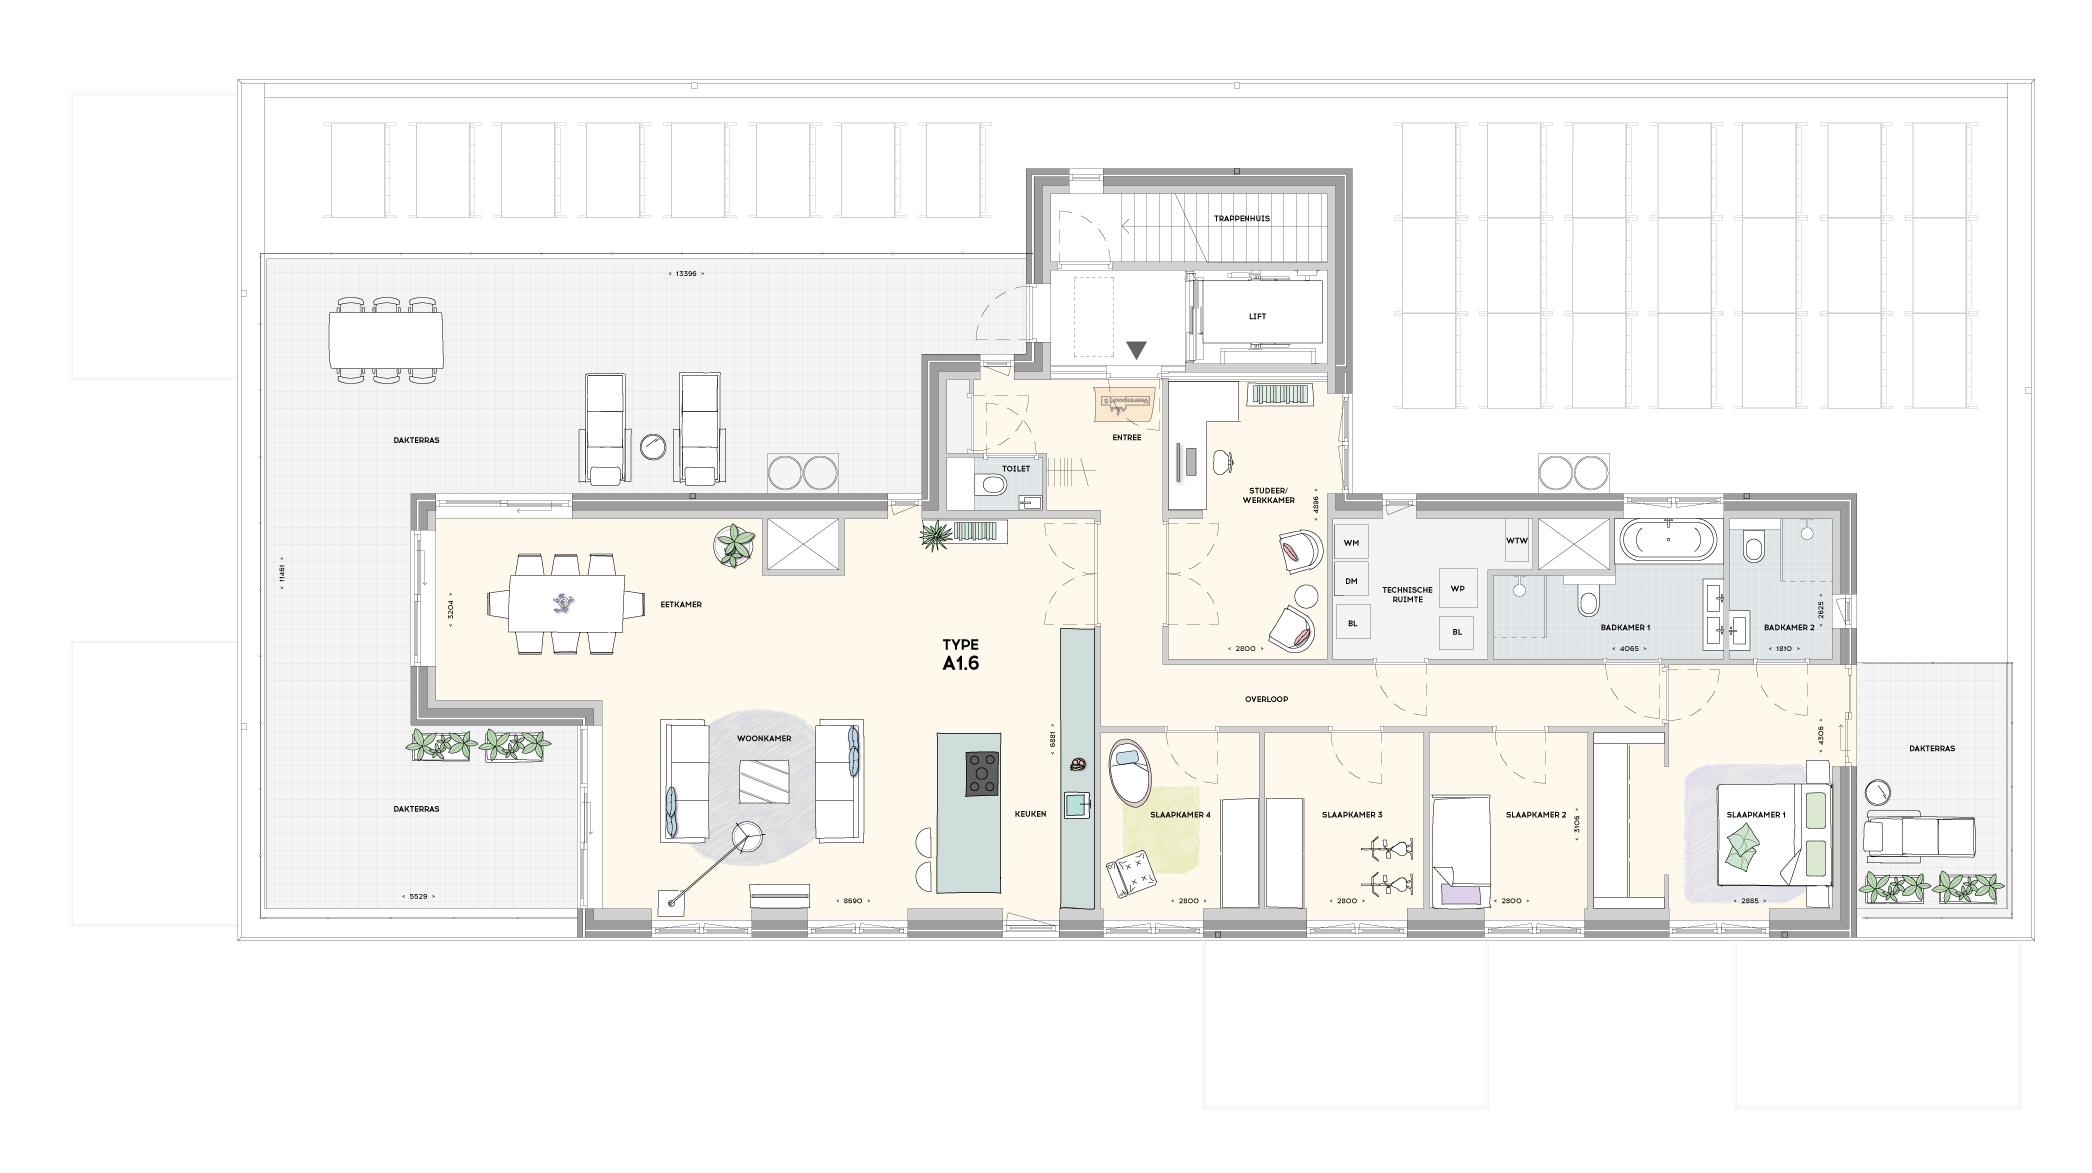 Gebouw 1 penthouse